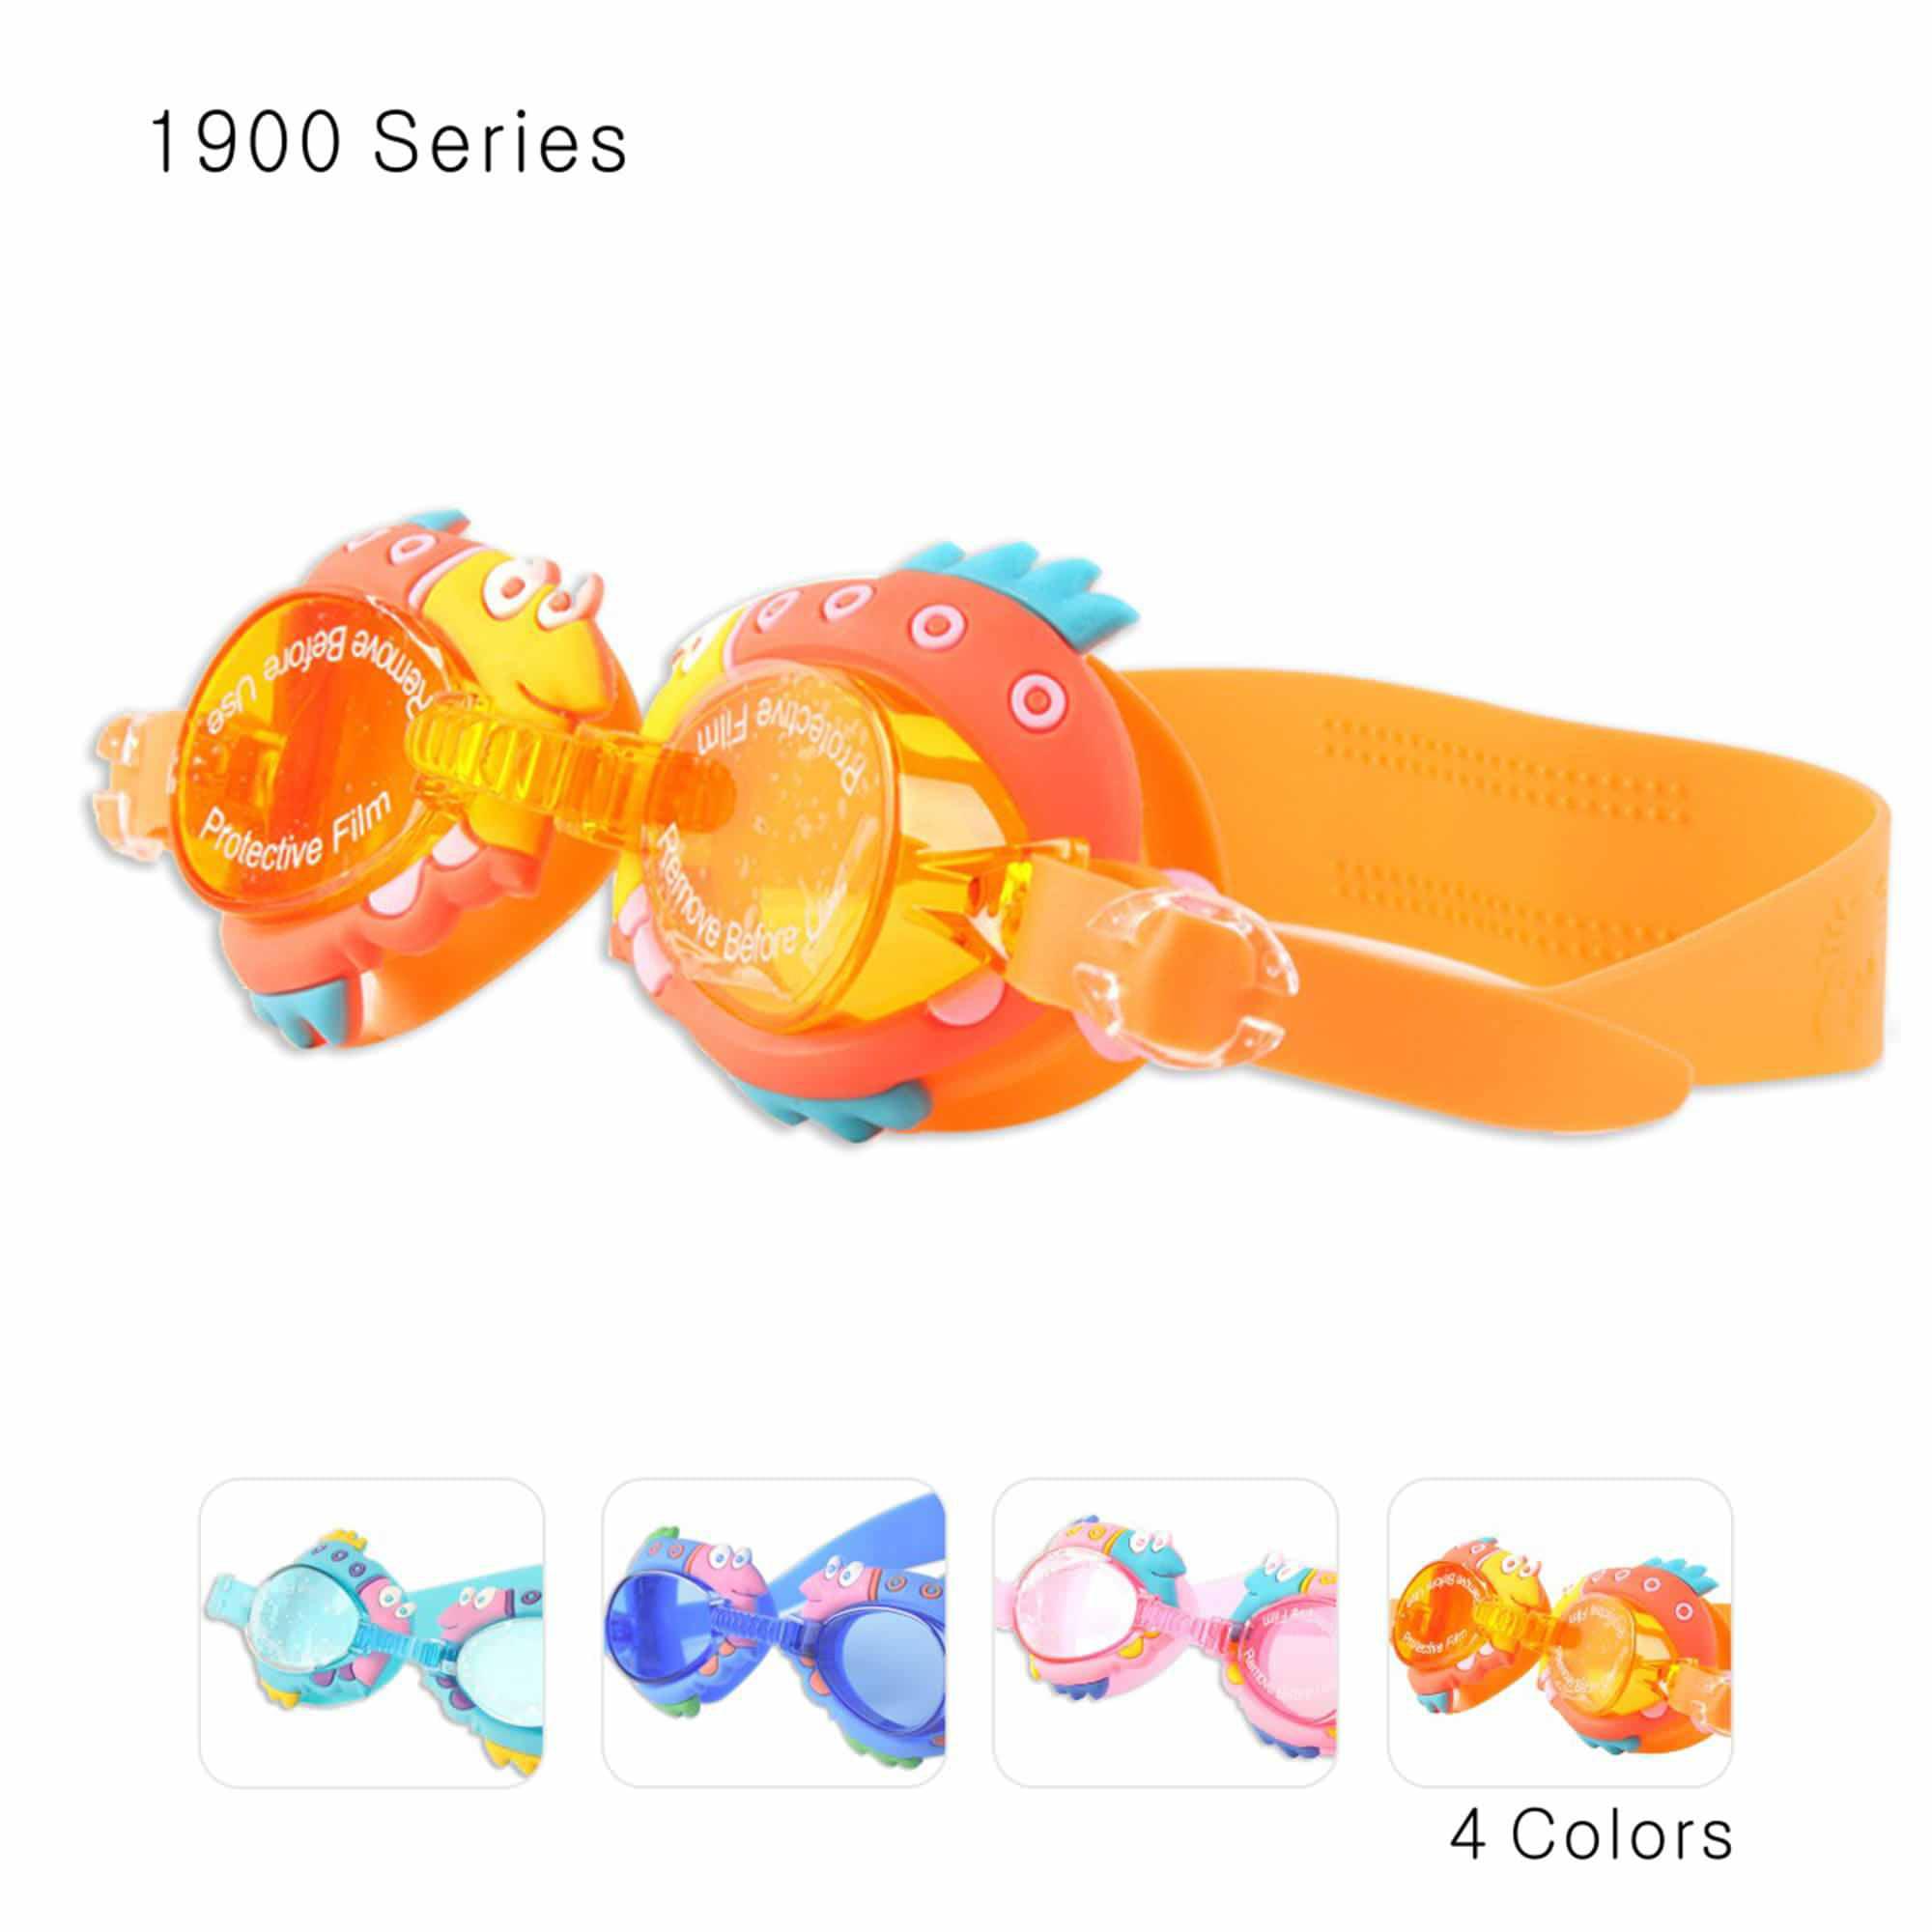 JML Kid Goggles, Cute Animal Design Swim Goggles Soft Silicone, Anti-Fog, No Leaking, UV Protection Hypoallergenic... by JML